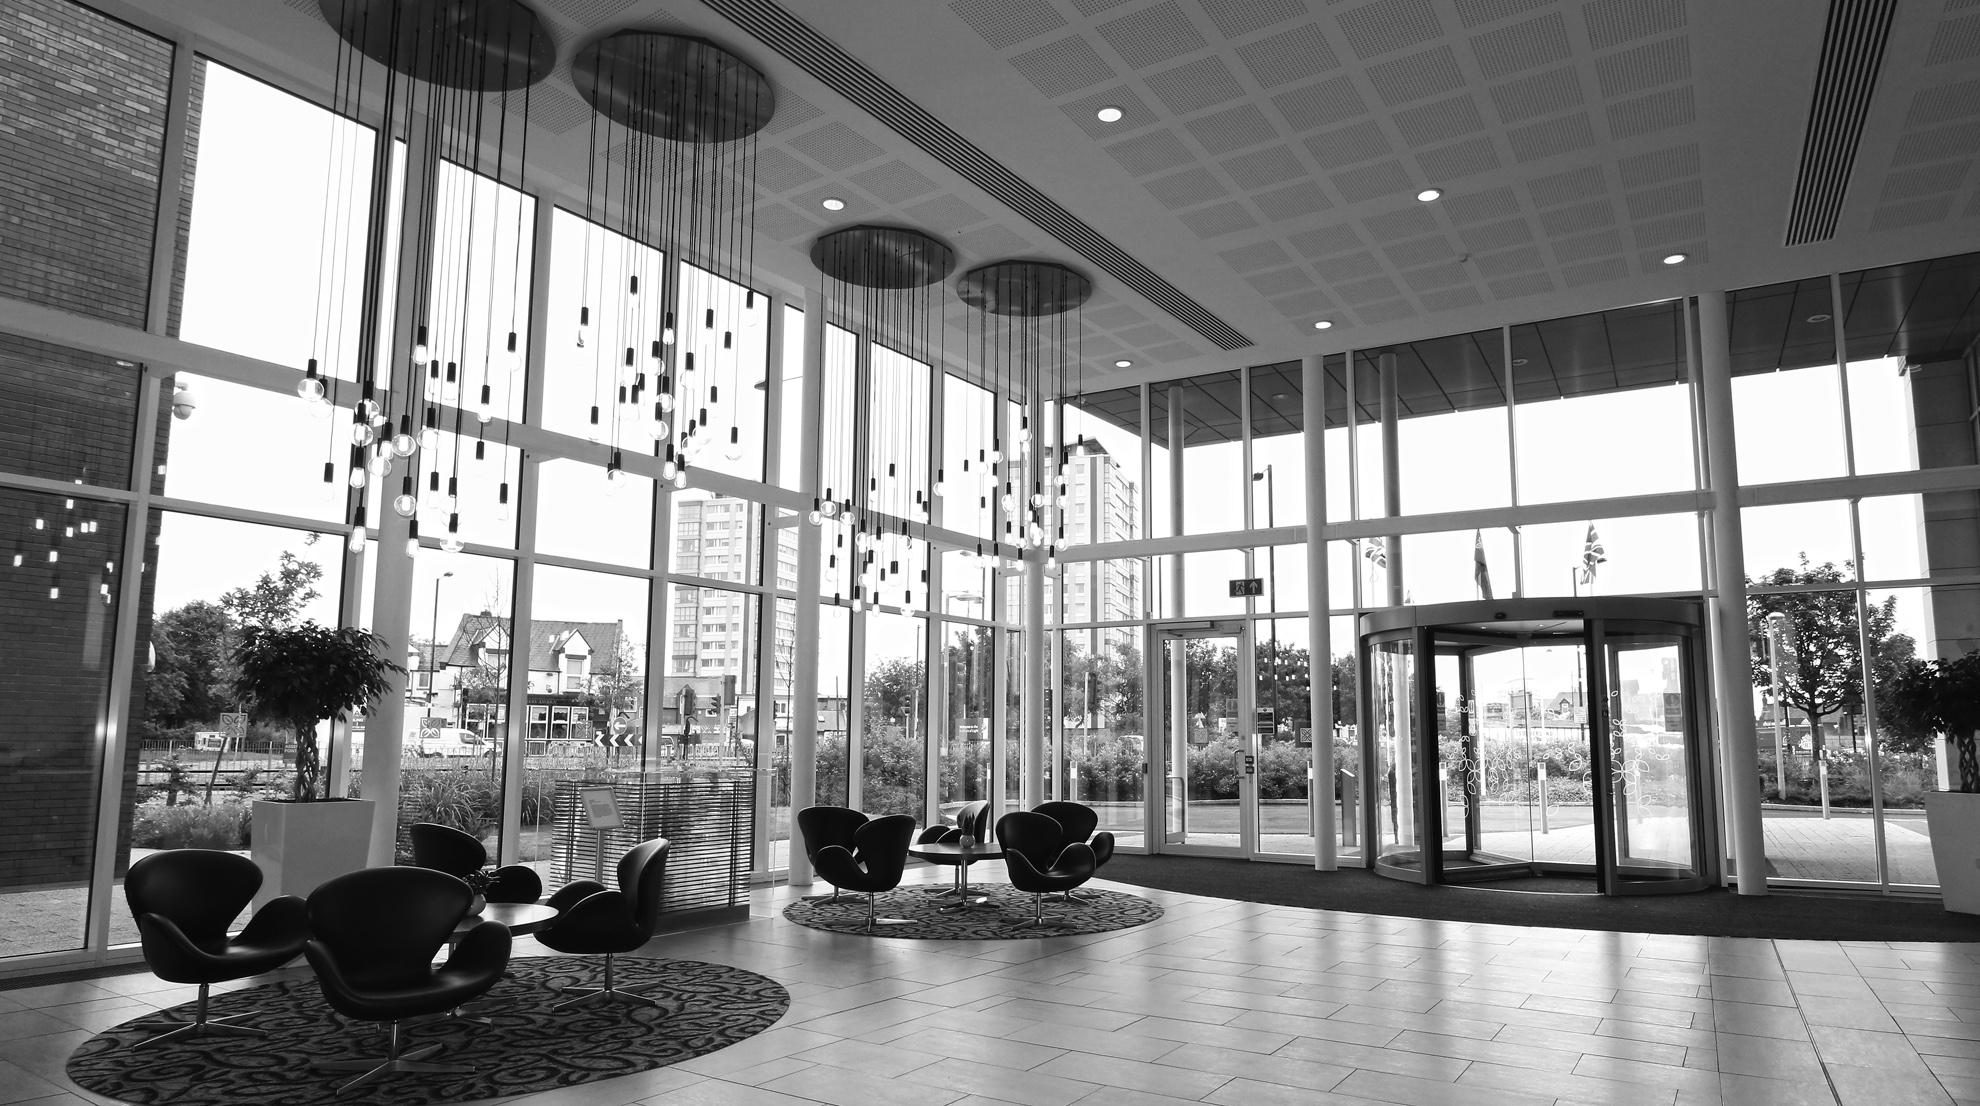 Hilton Garden Inn – Sunderland